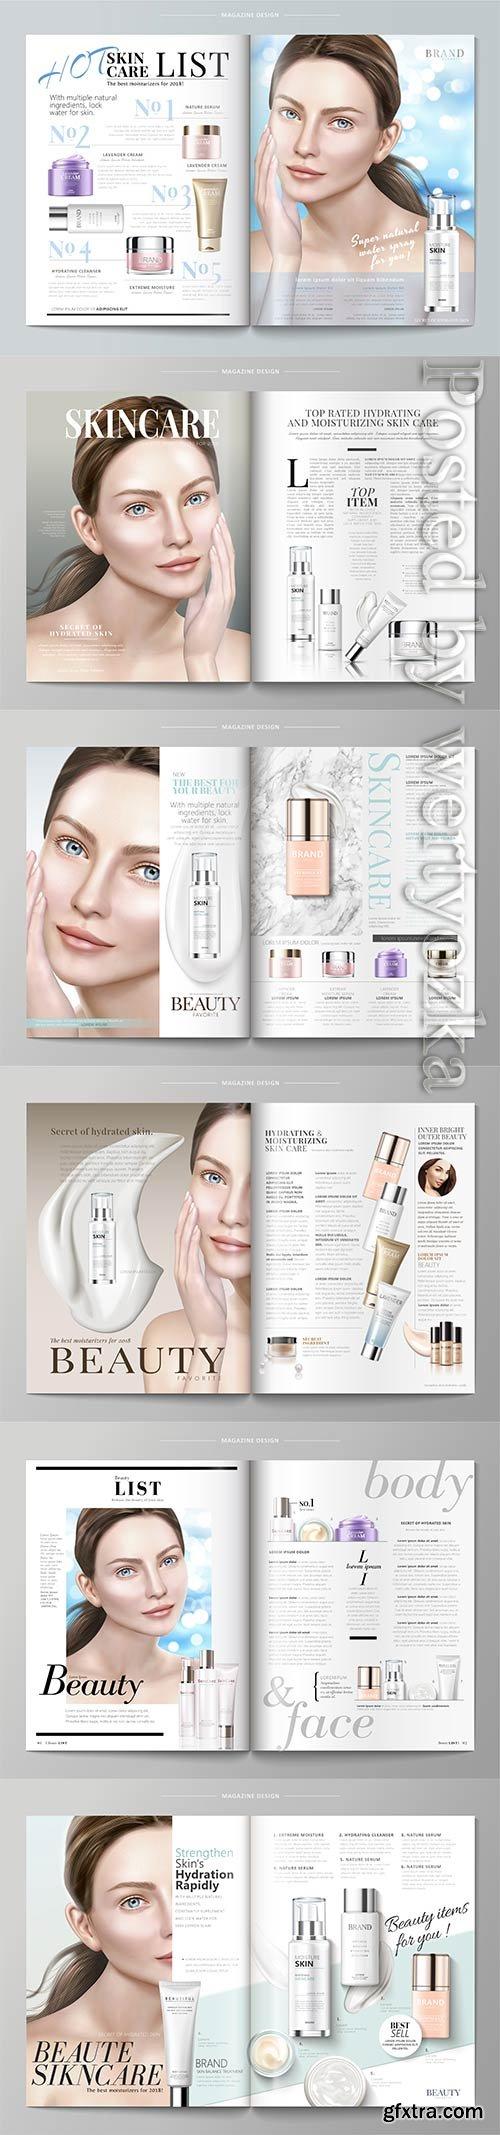 Elegant skin care magazine vector template